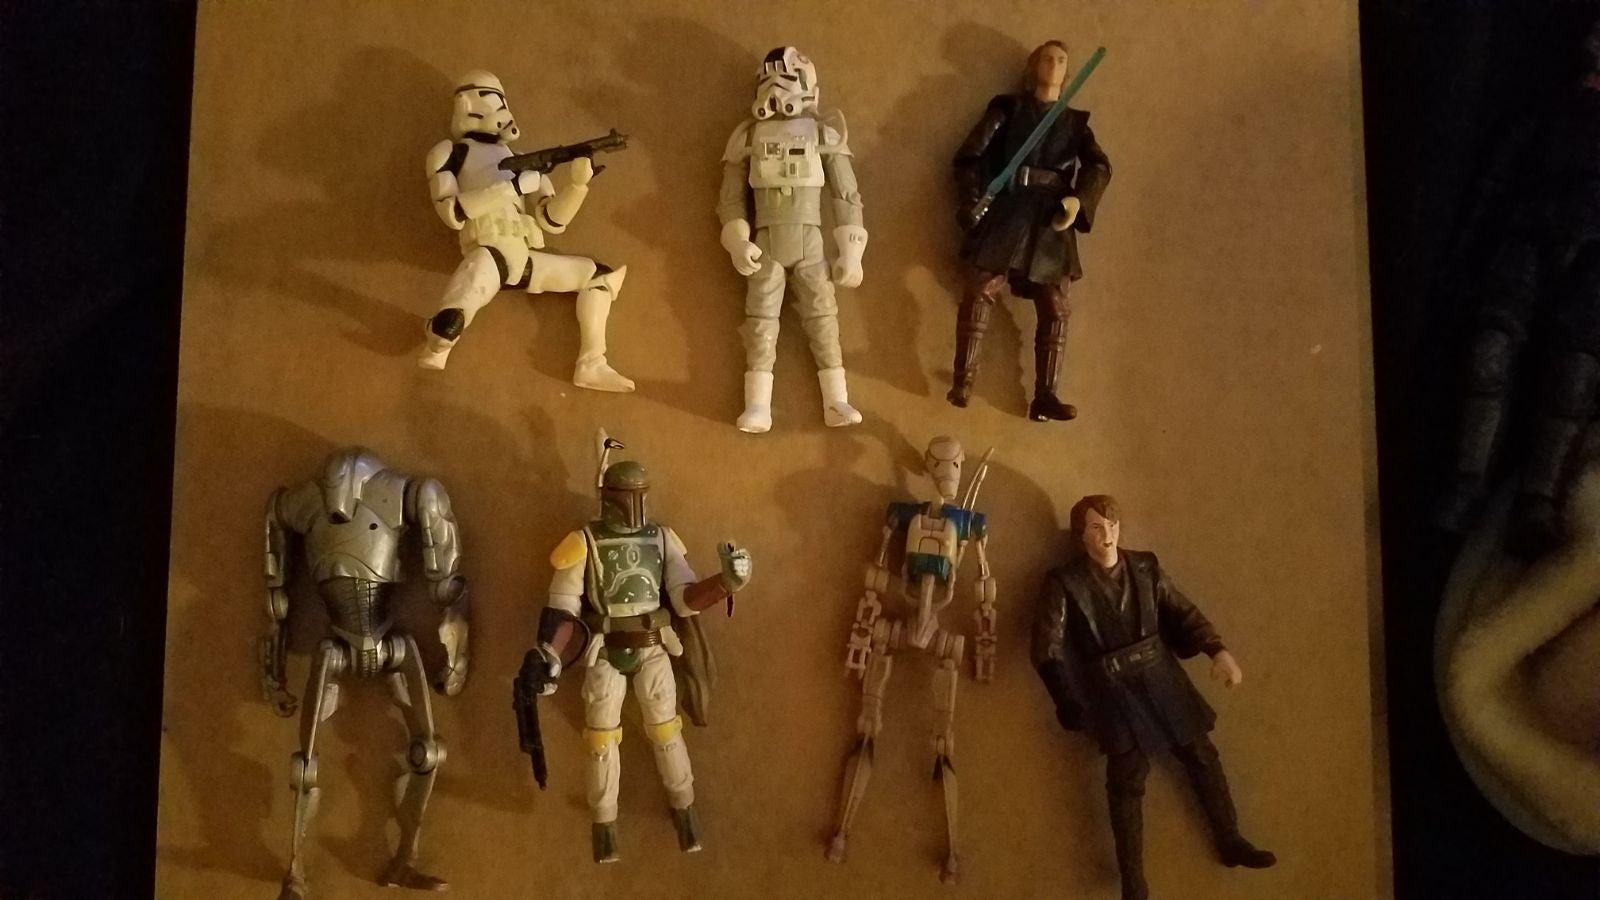 Star wars 3.75 action figure Lot